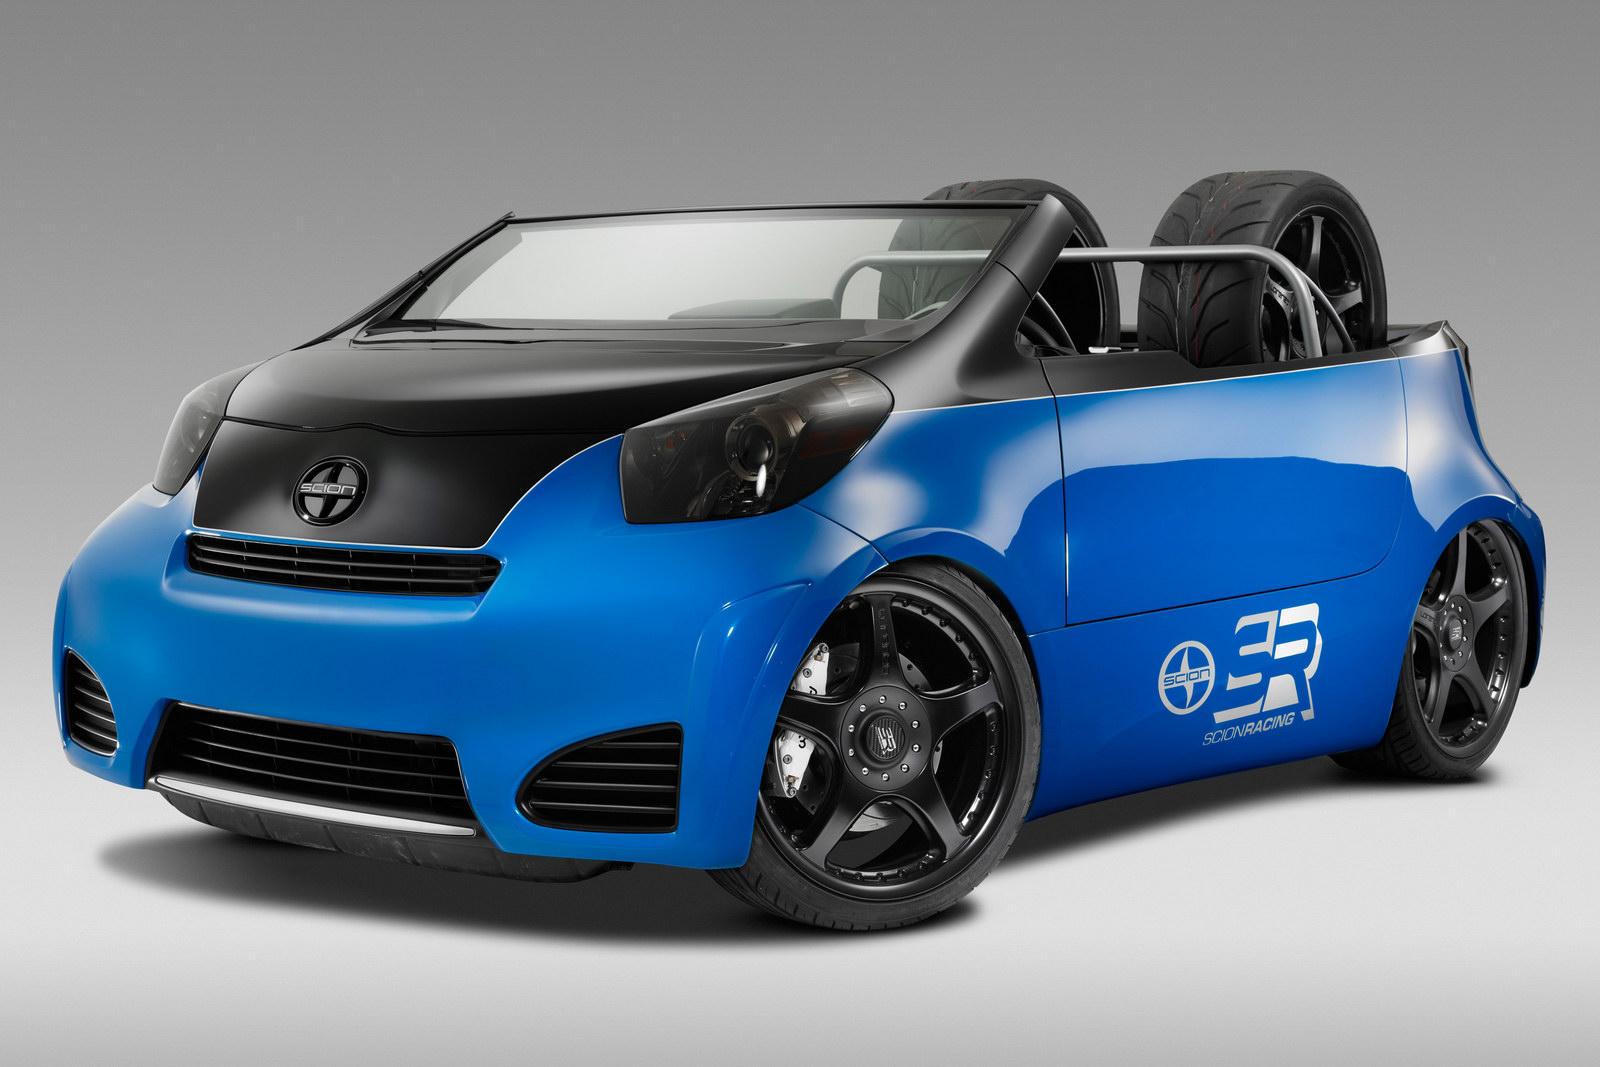 Cartel Pitt Boss Scion Iq Brings The Summer To 2011 Sema